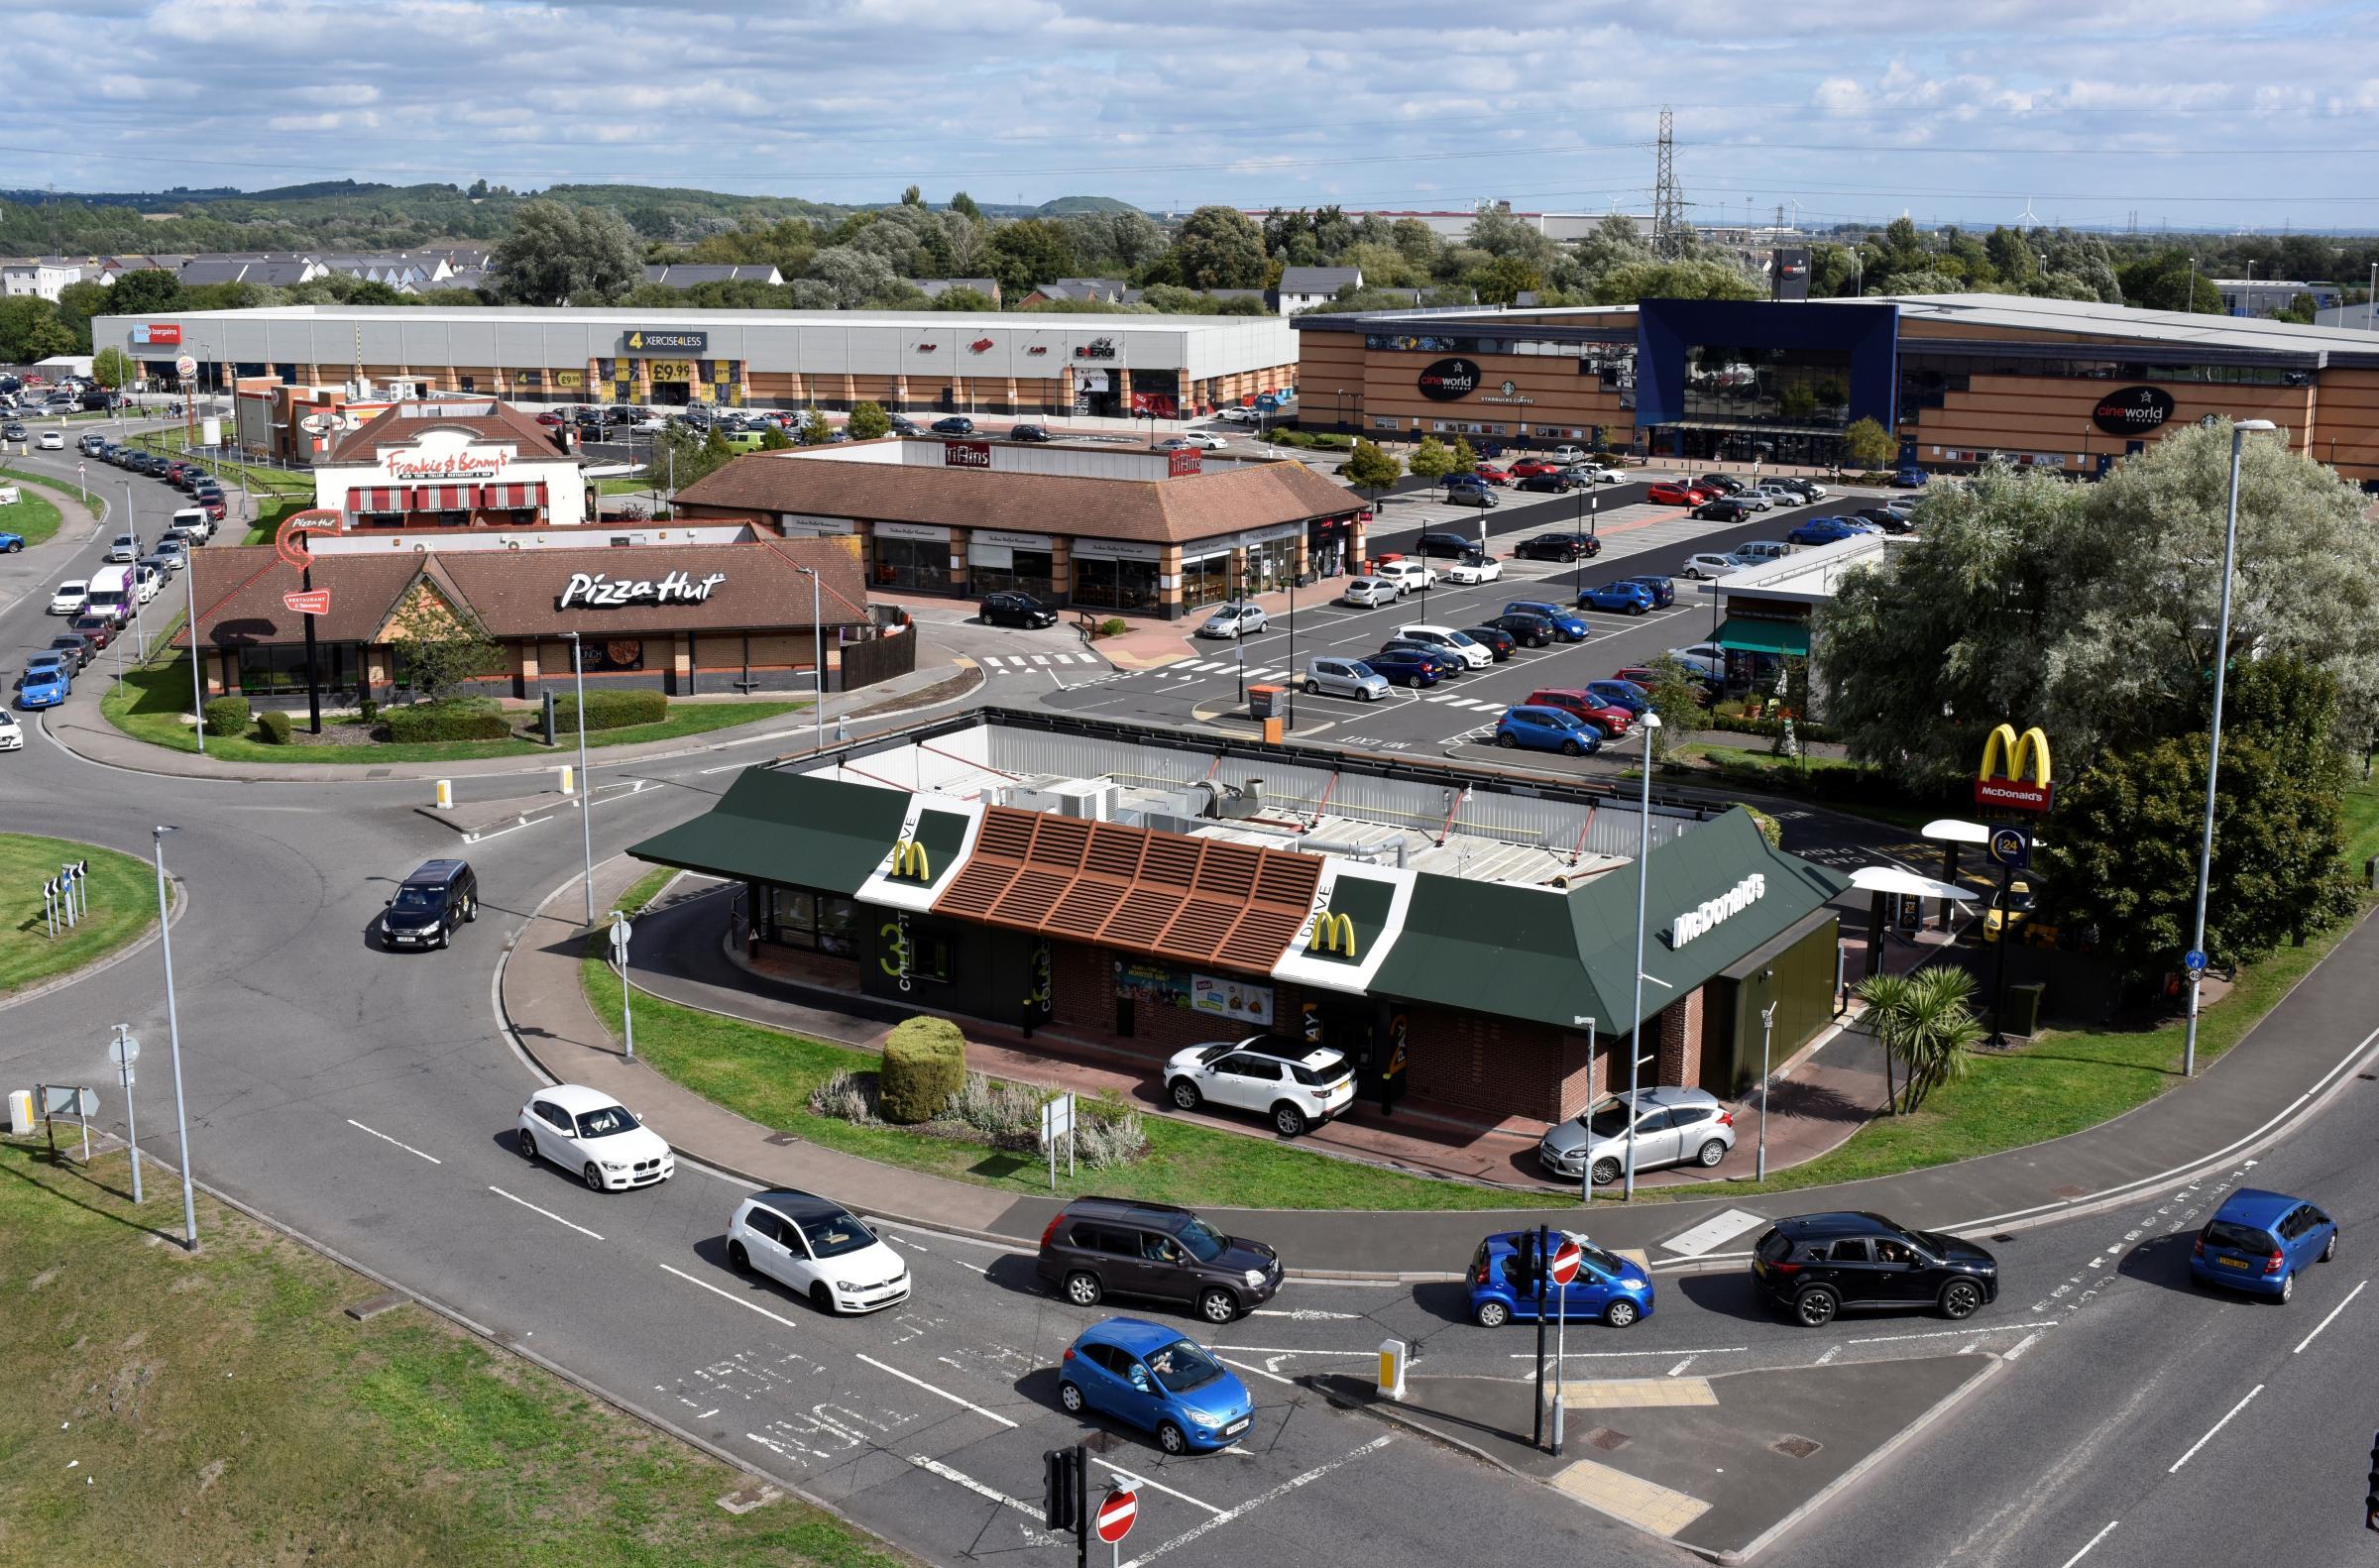 Newport Leisure Park Housing Brands Like Cineworld Pizza